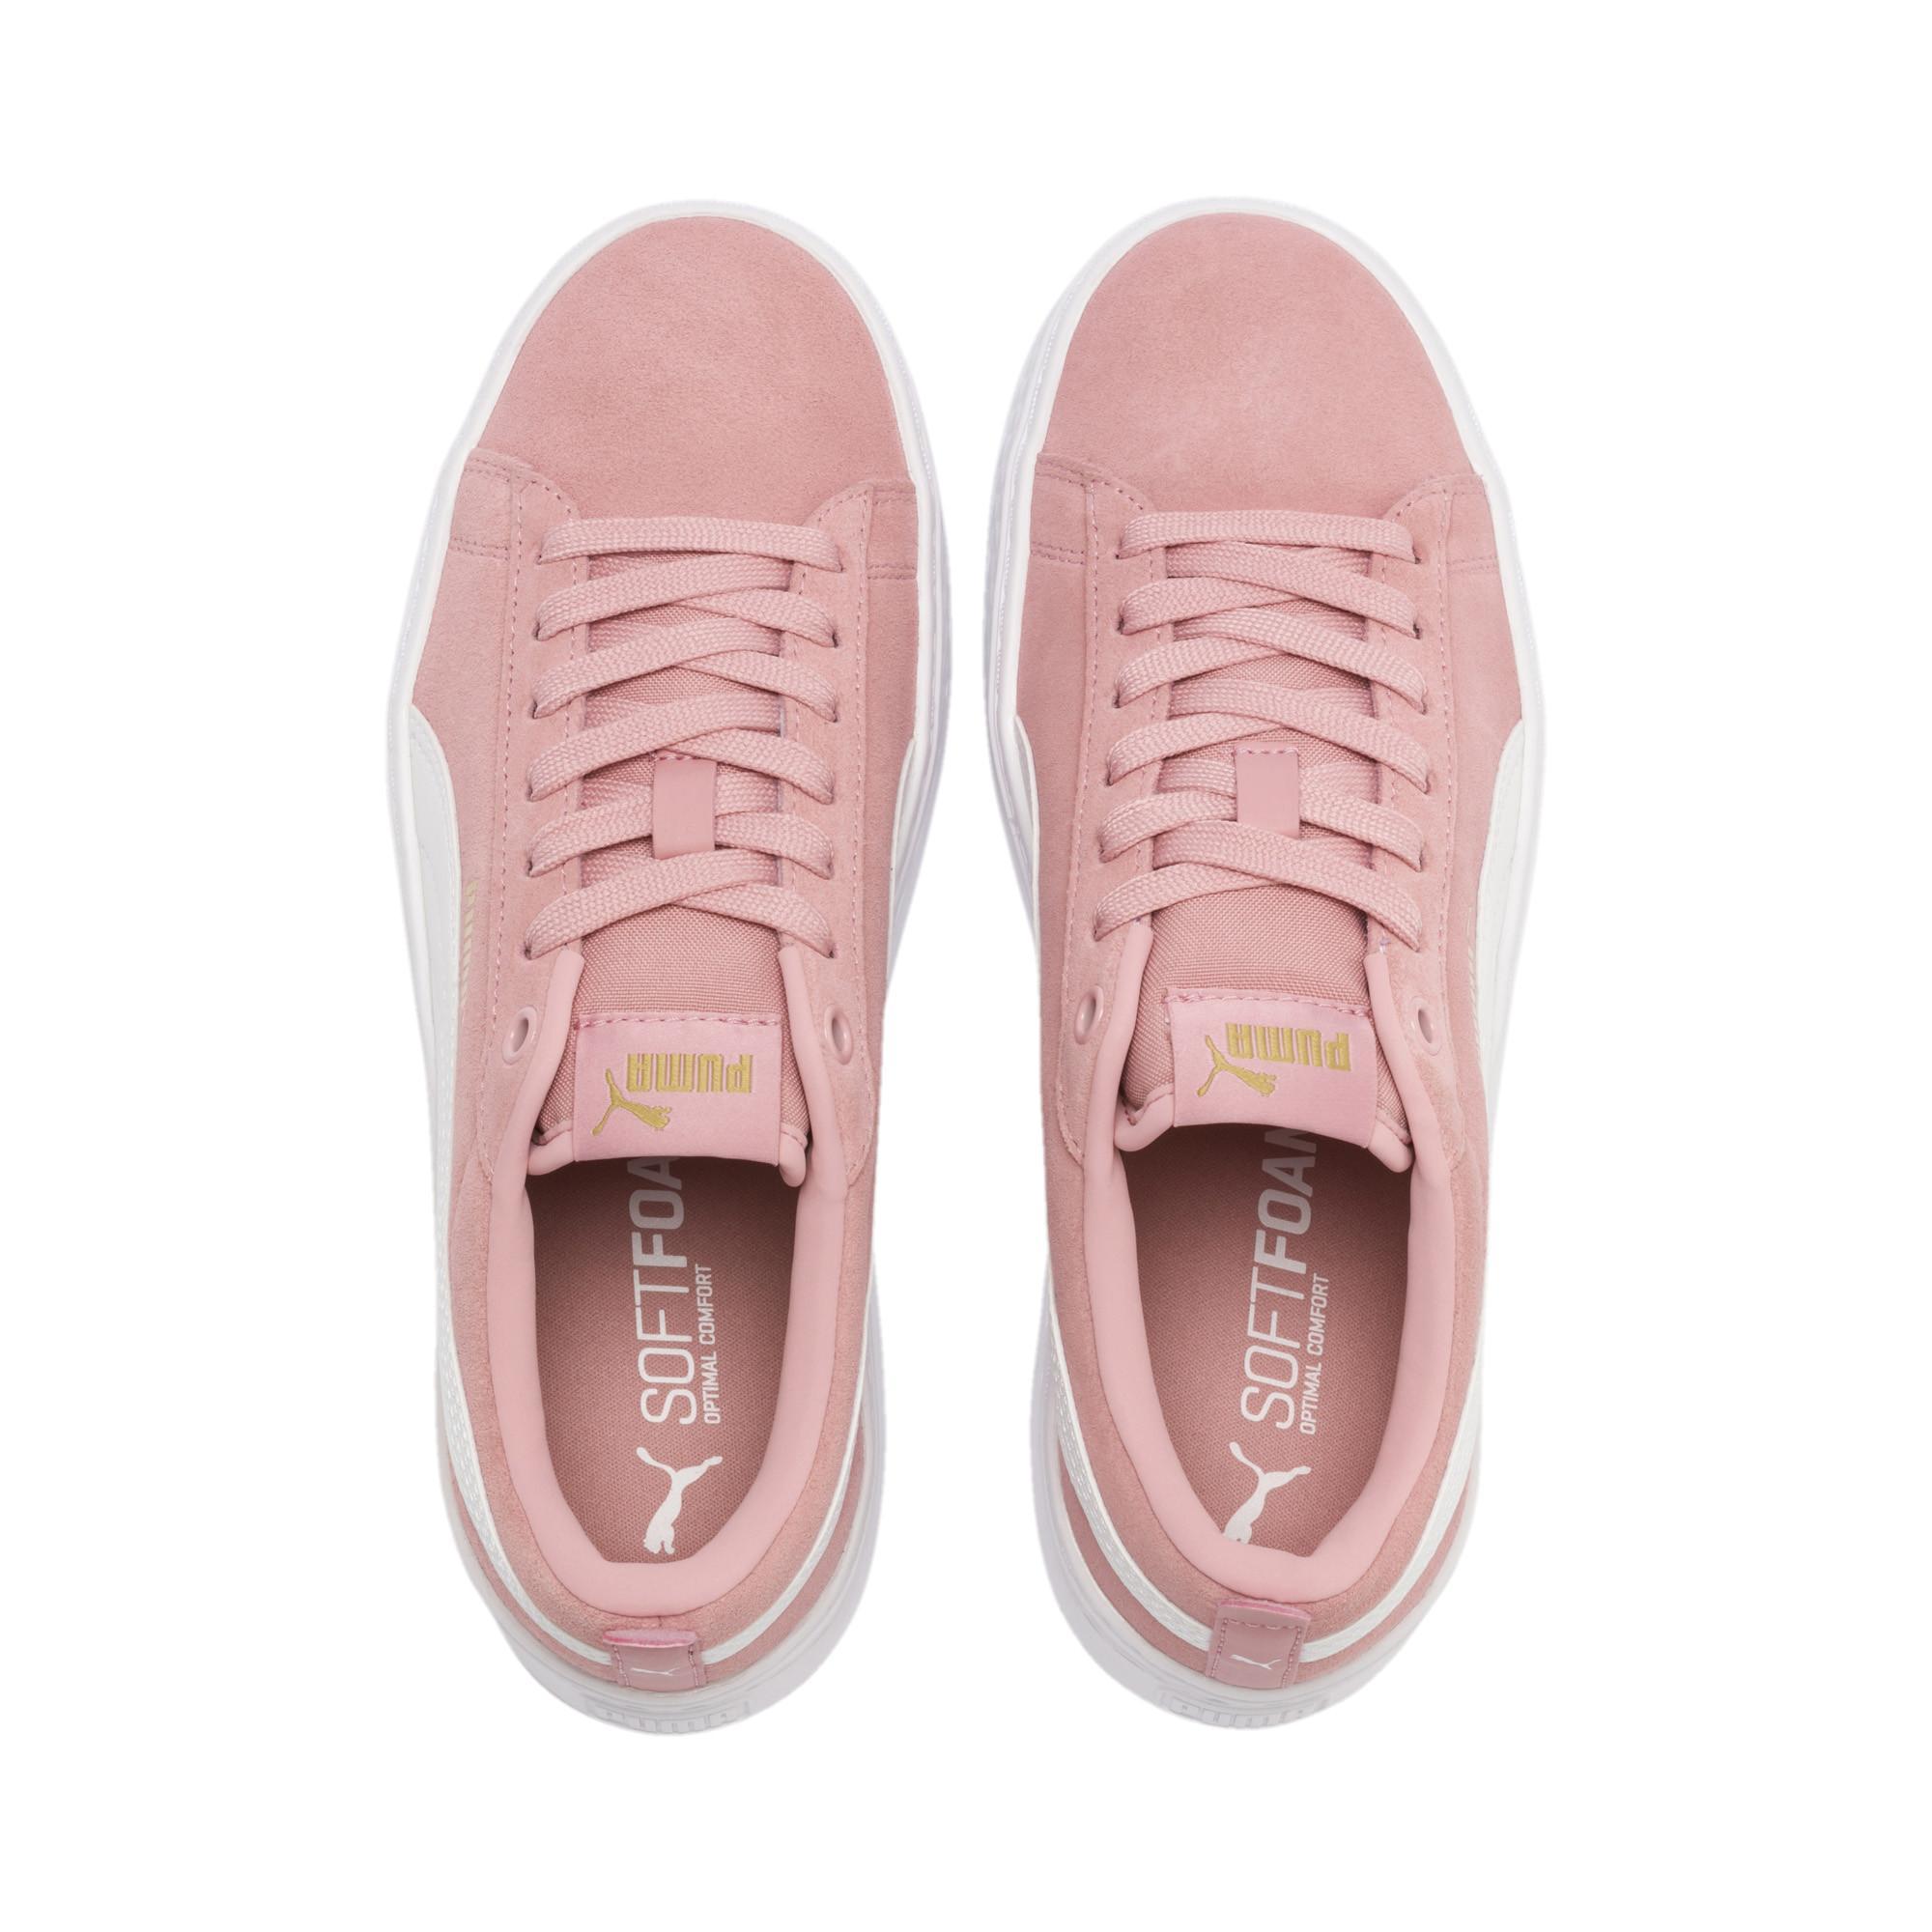 48b11bb4ff8 Pink Smash Platform Suede Women's Sneakers